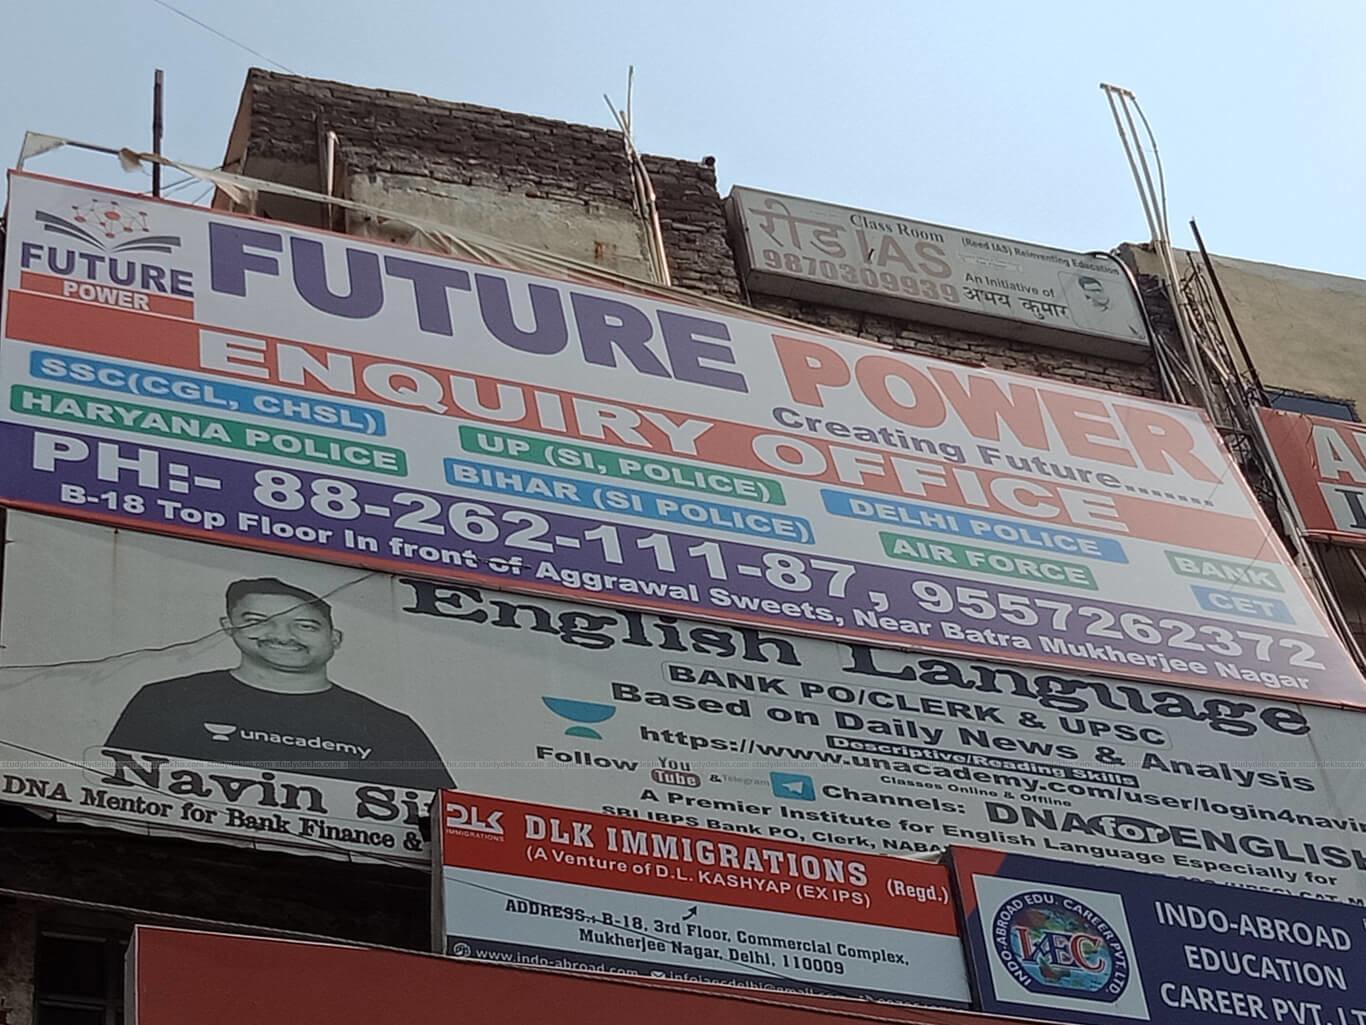 FUTURE POWER Logo